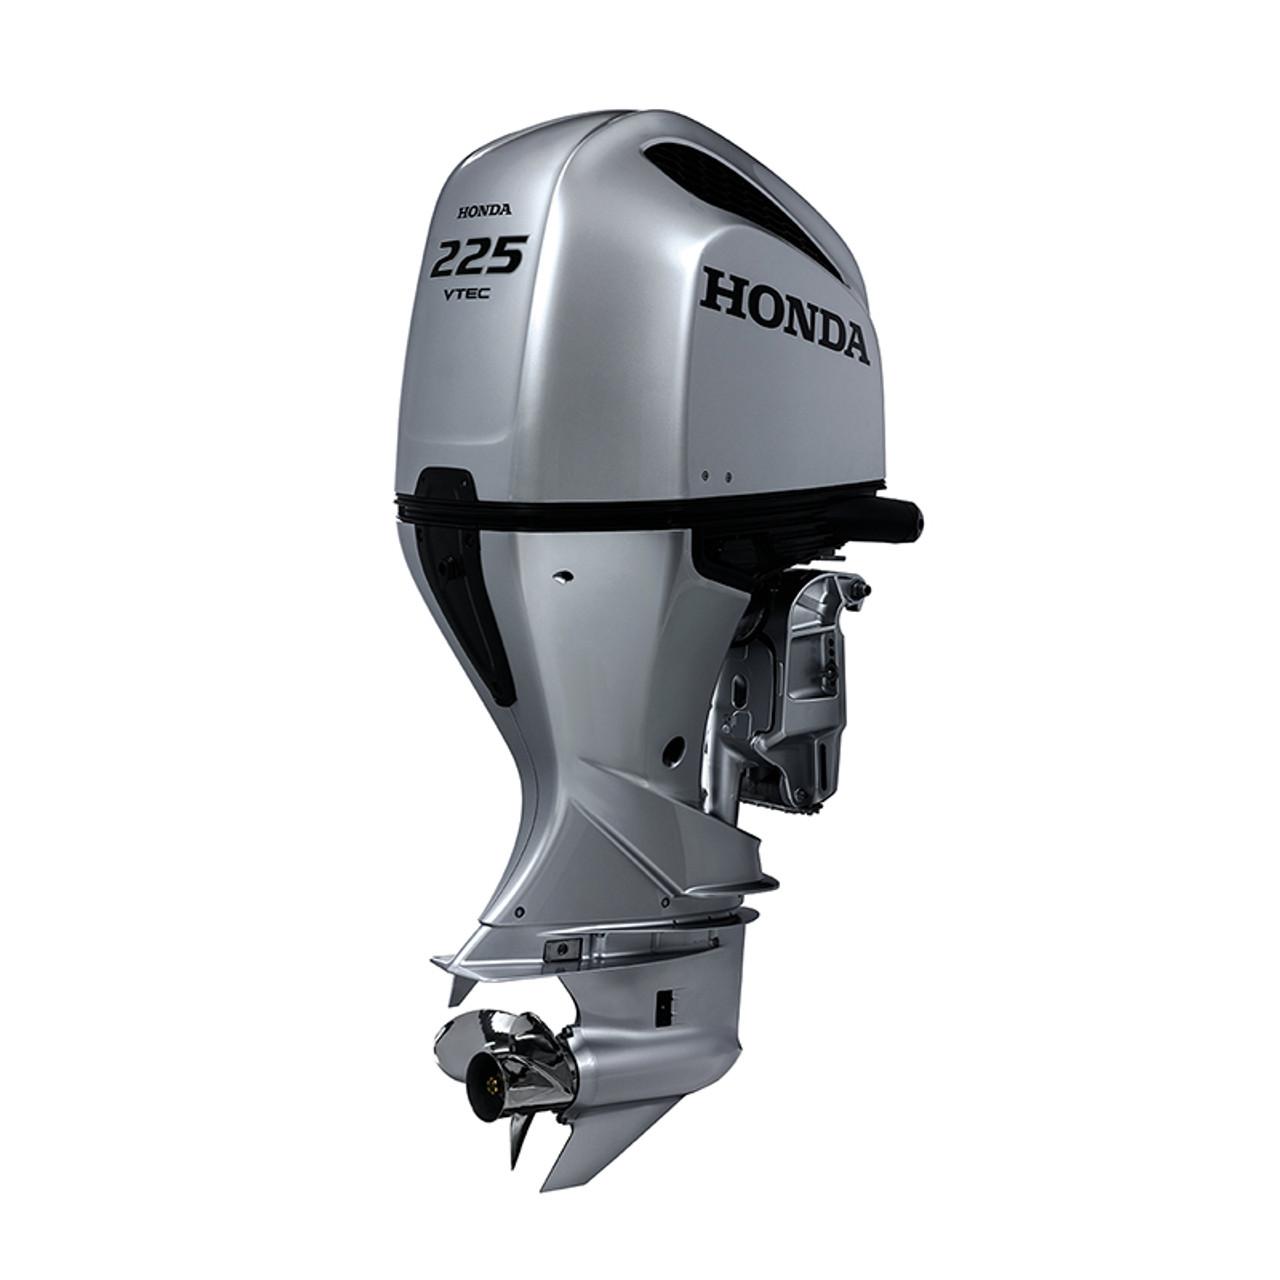 new 2019 honda bf225 4 stroke outboard motor [ 1280 x 1280 Pixel ]